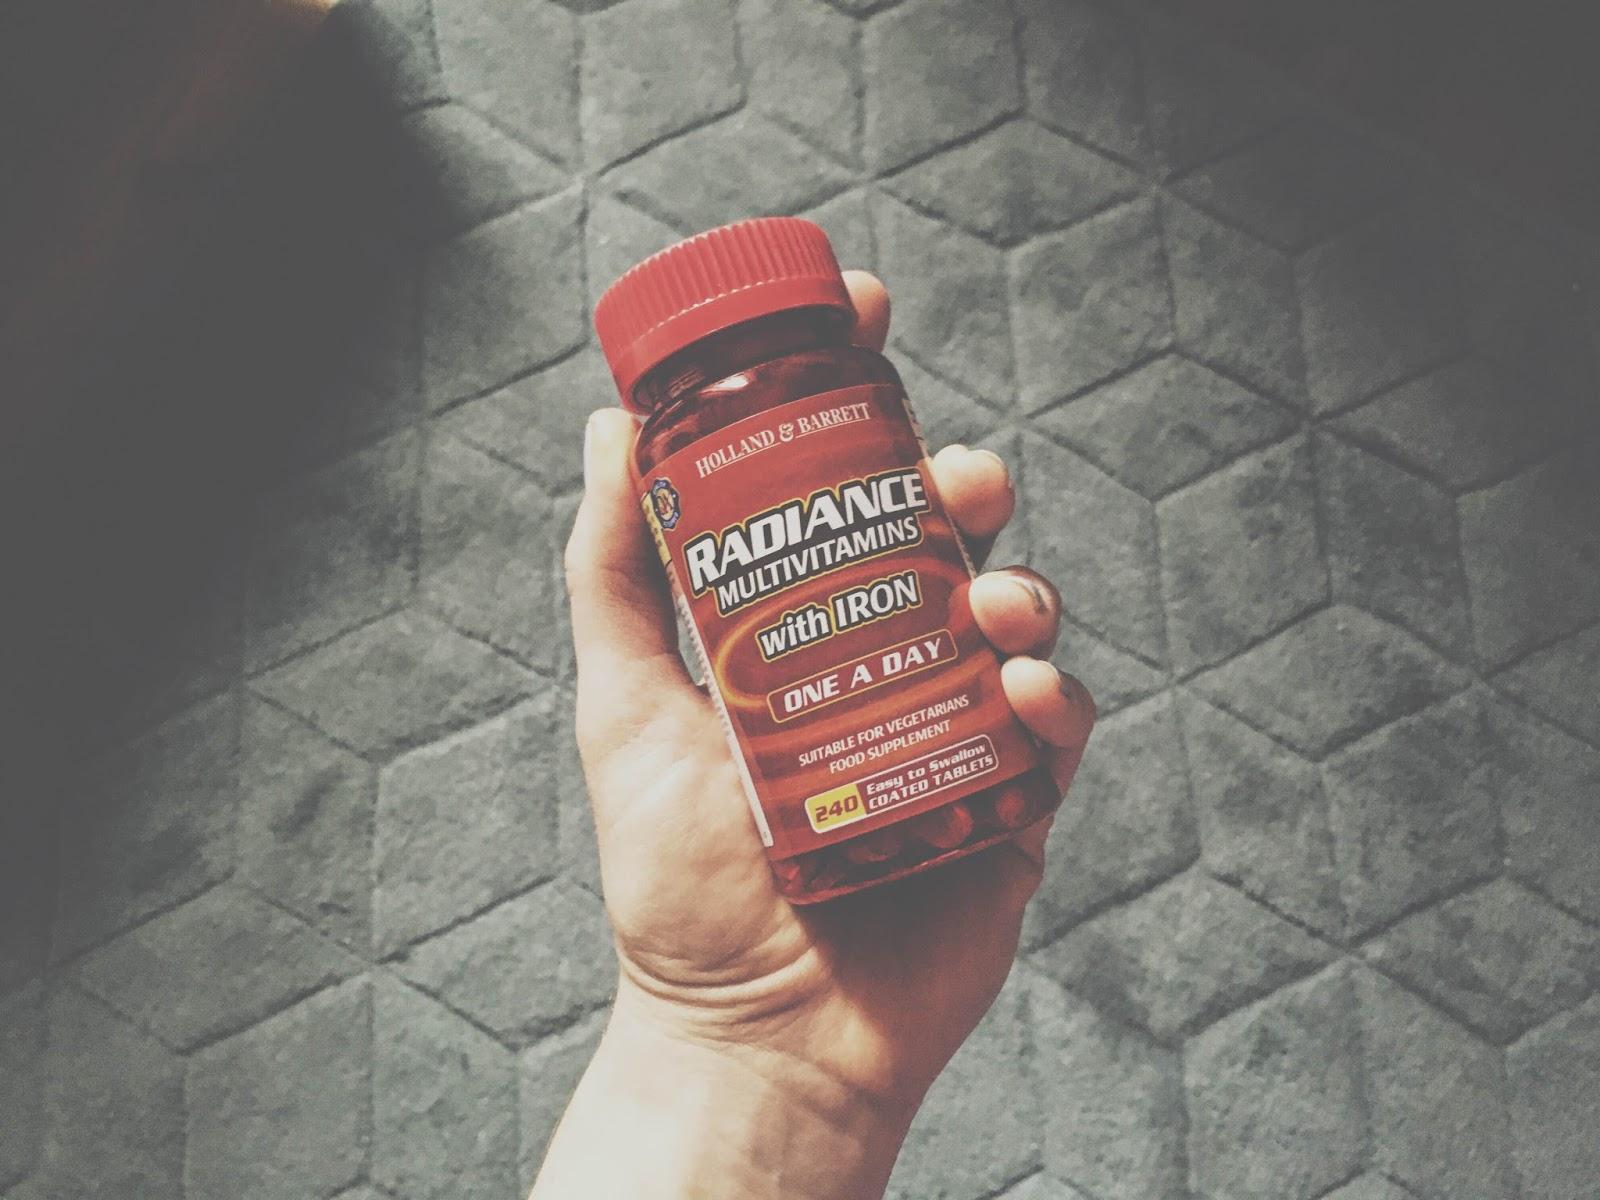 Favourite vitamins alice barnes wellbeing blogger